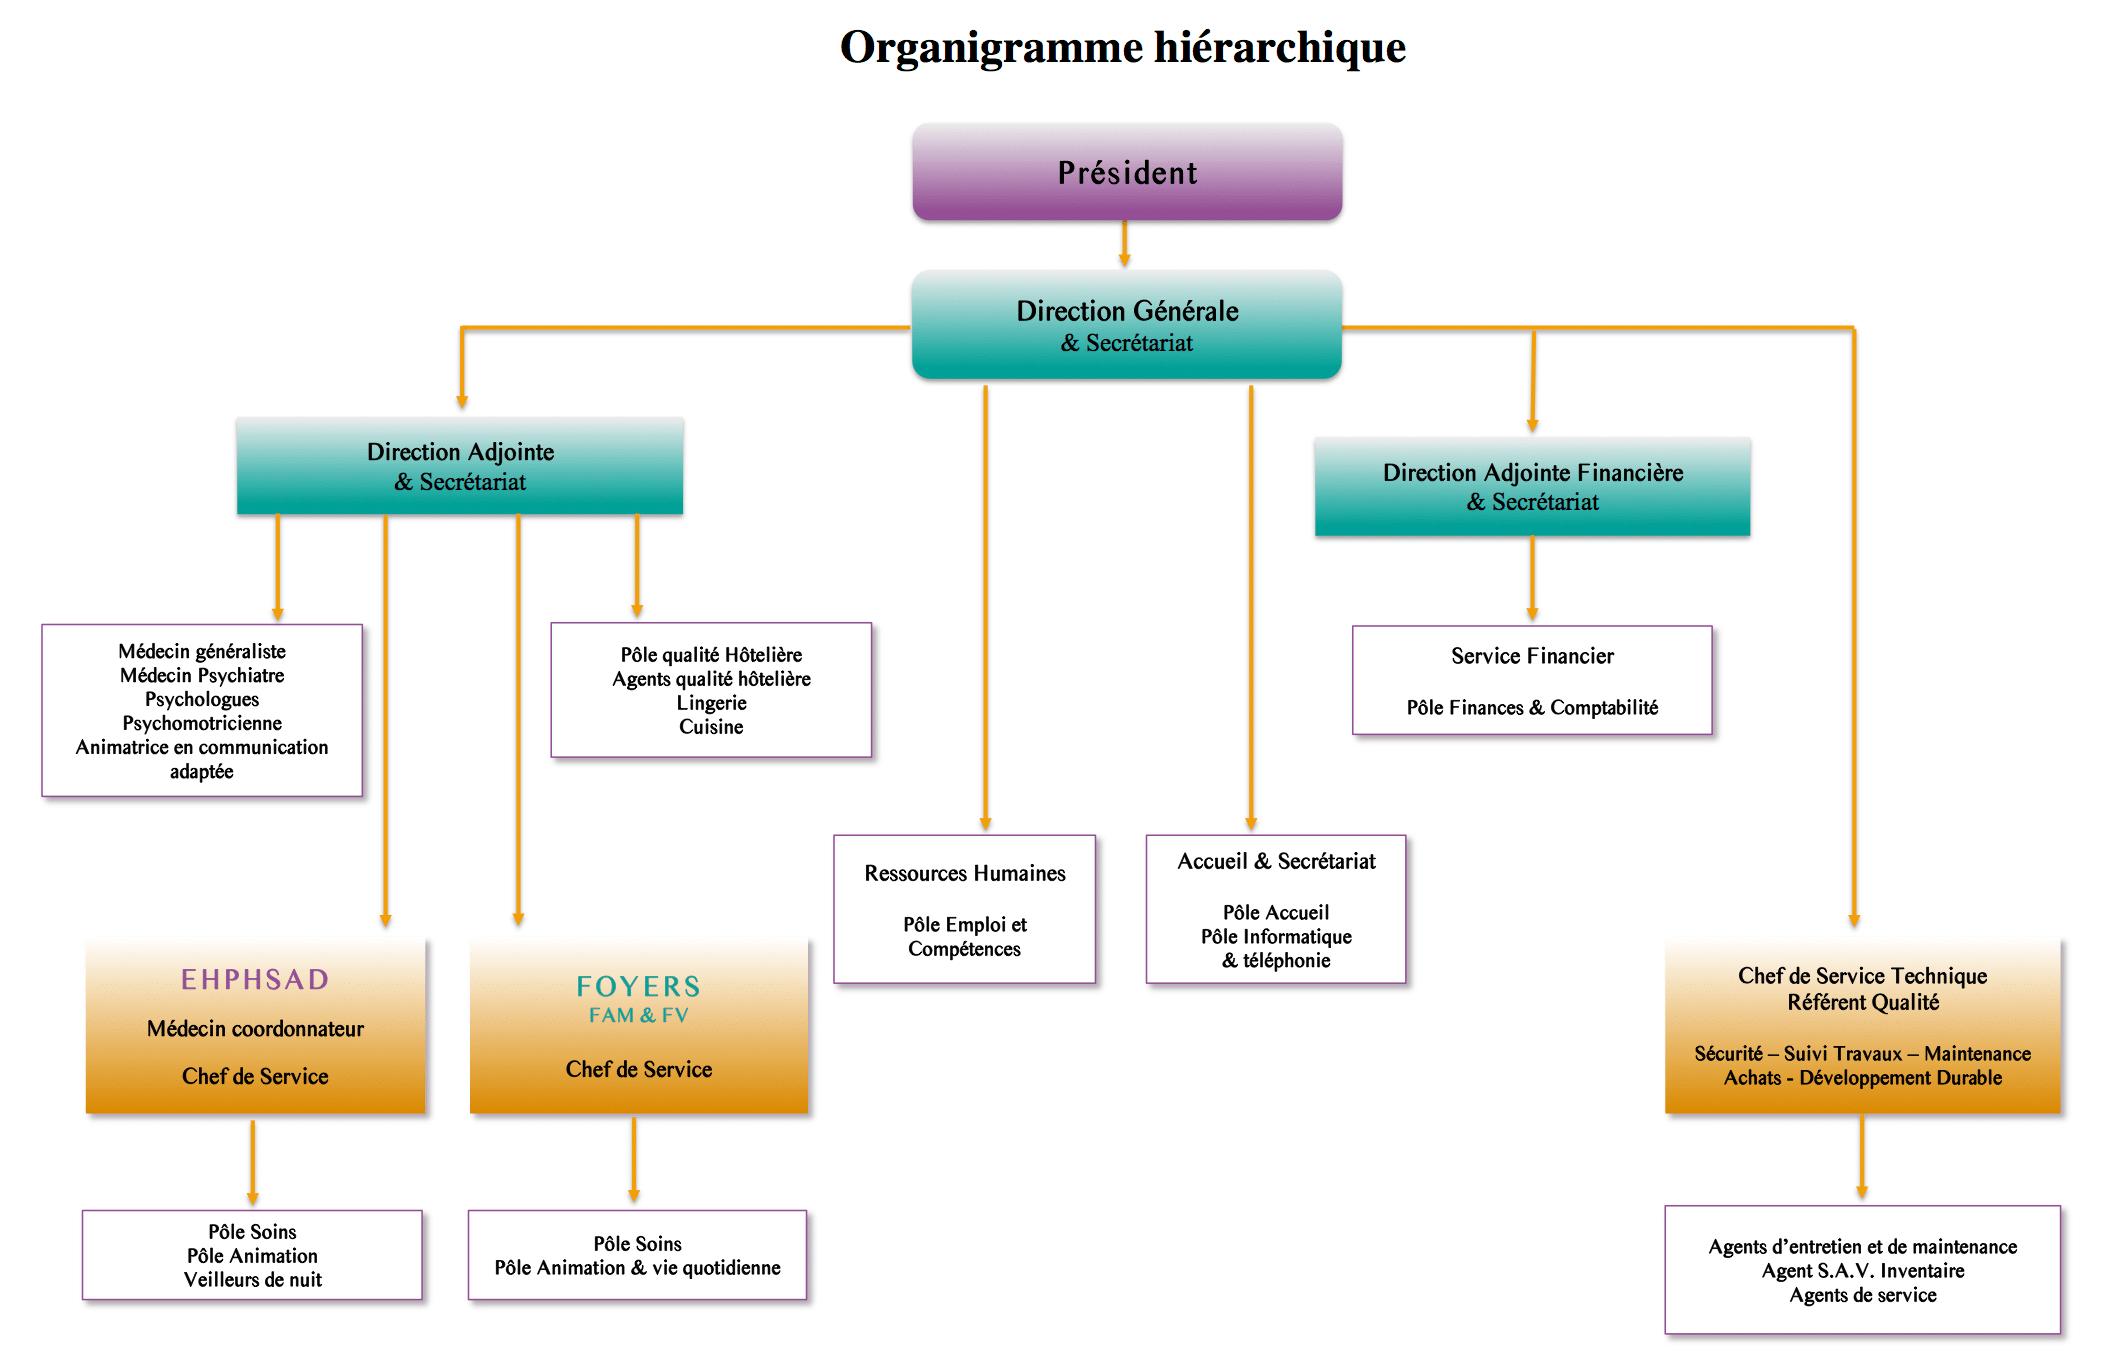 Une quipe pluri professionnelle qualifi e association - Organigramme hierarchique open office ...